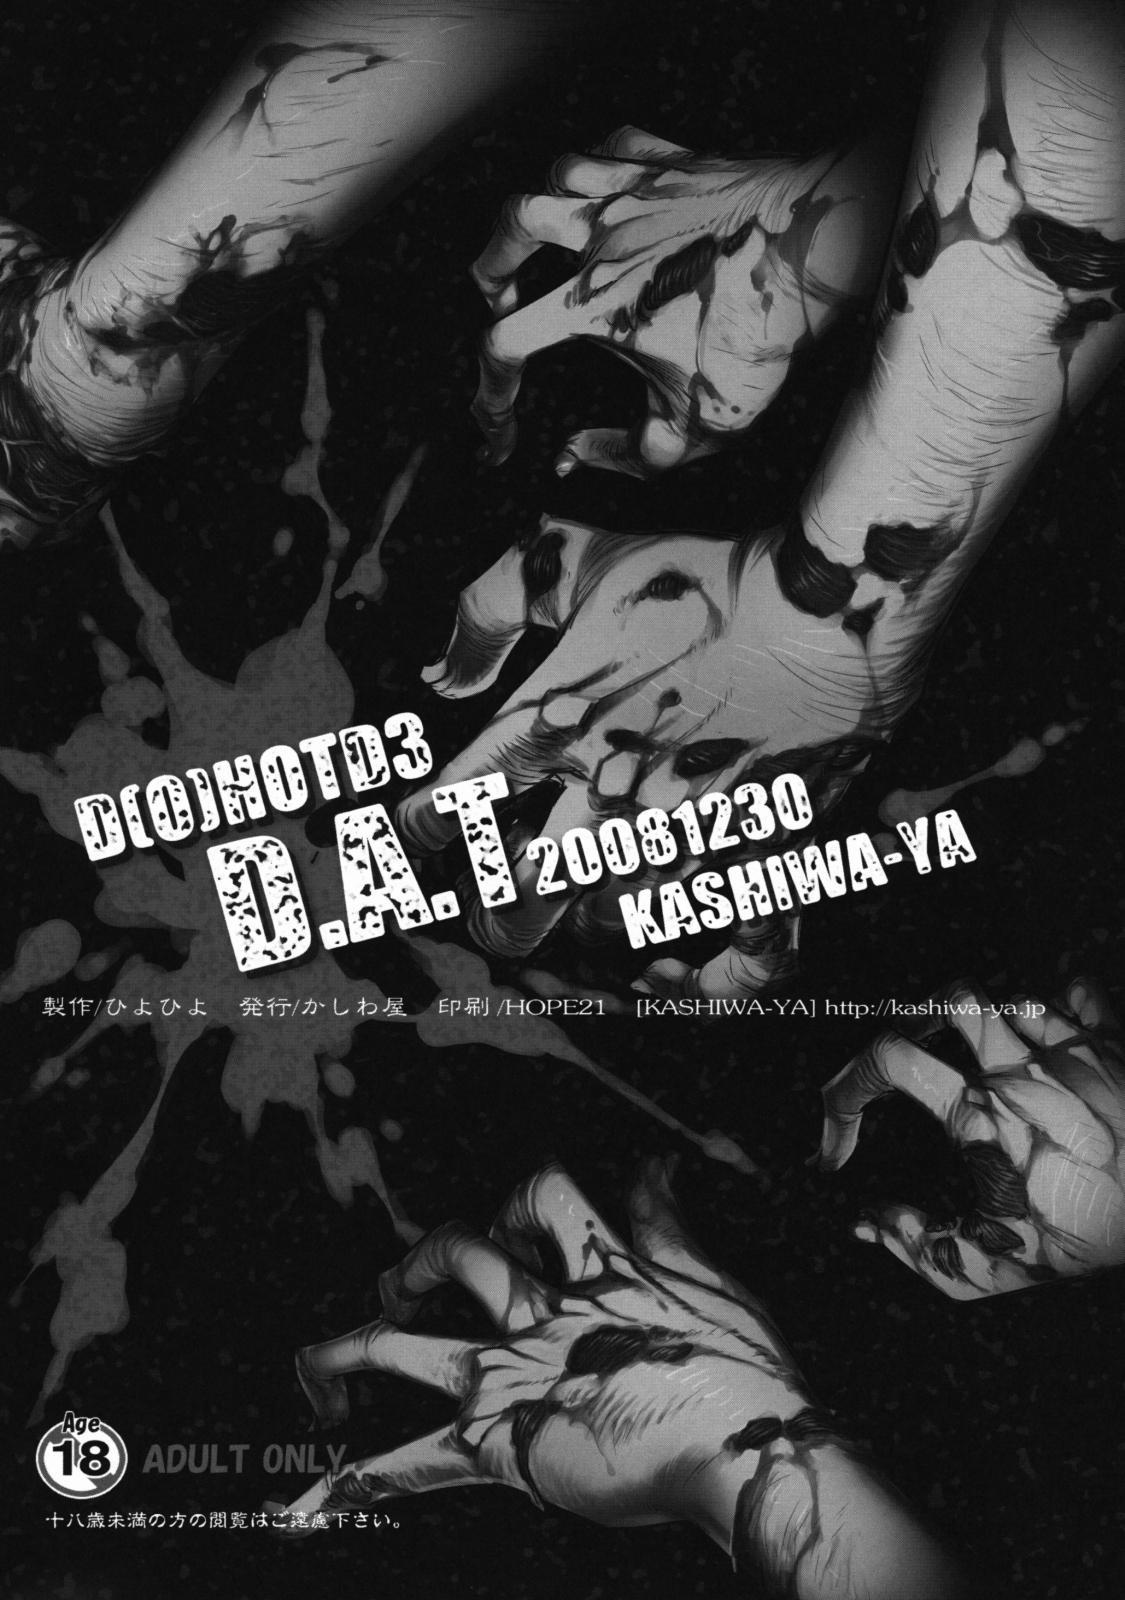 (C75) [Kashiwa-ya (Hiyo Hiyo)] D[O]HOTD3 D.A.T. (HIGHSCHOOL OF THE DEAD) [English] =LWB= 17